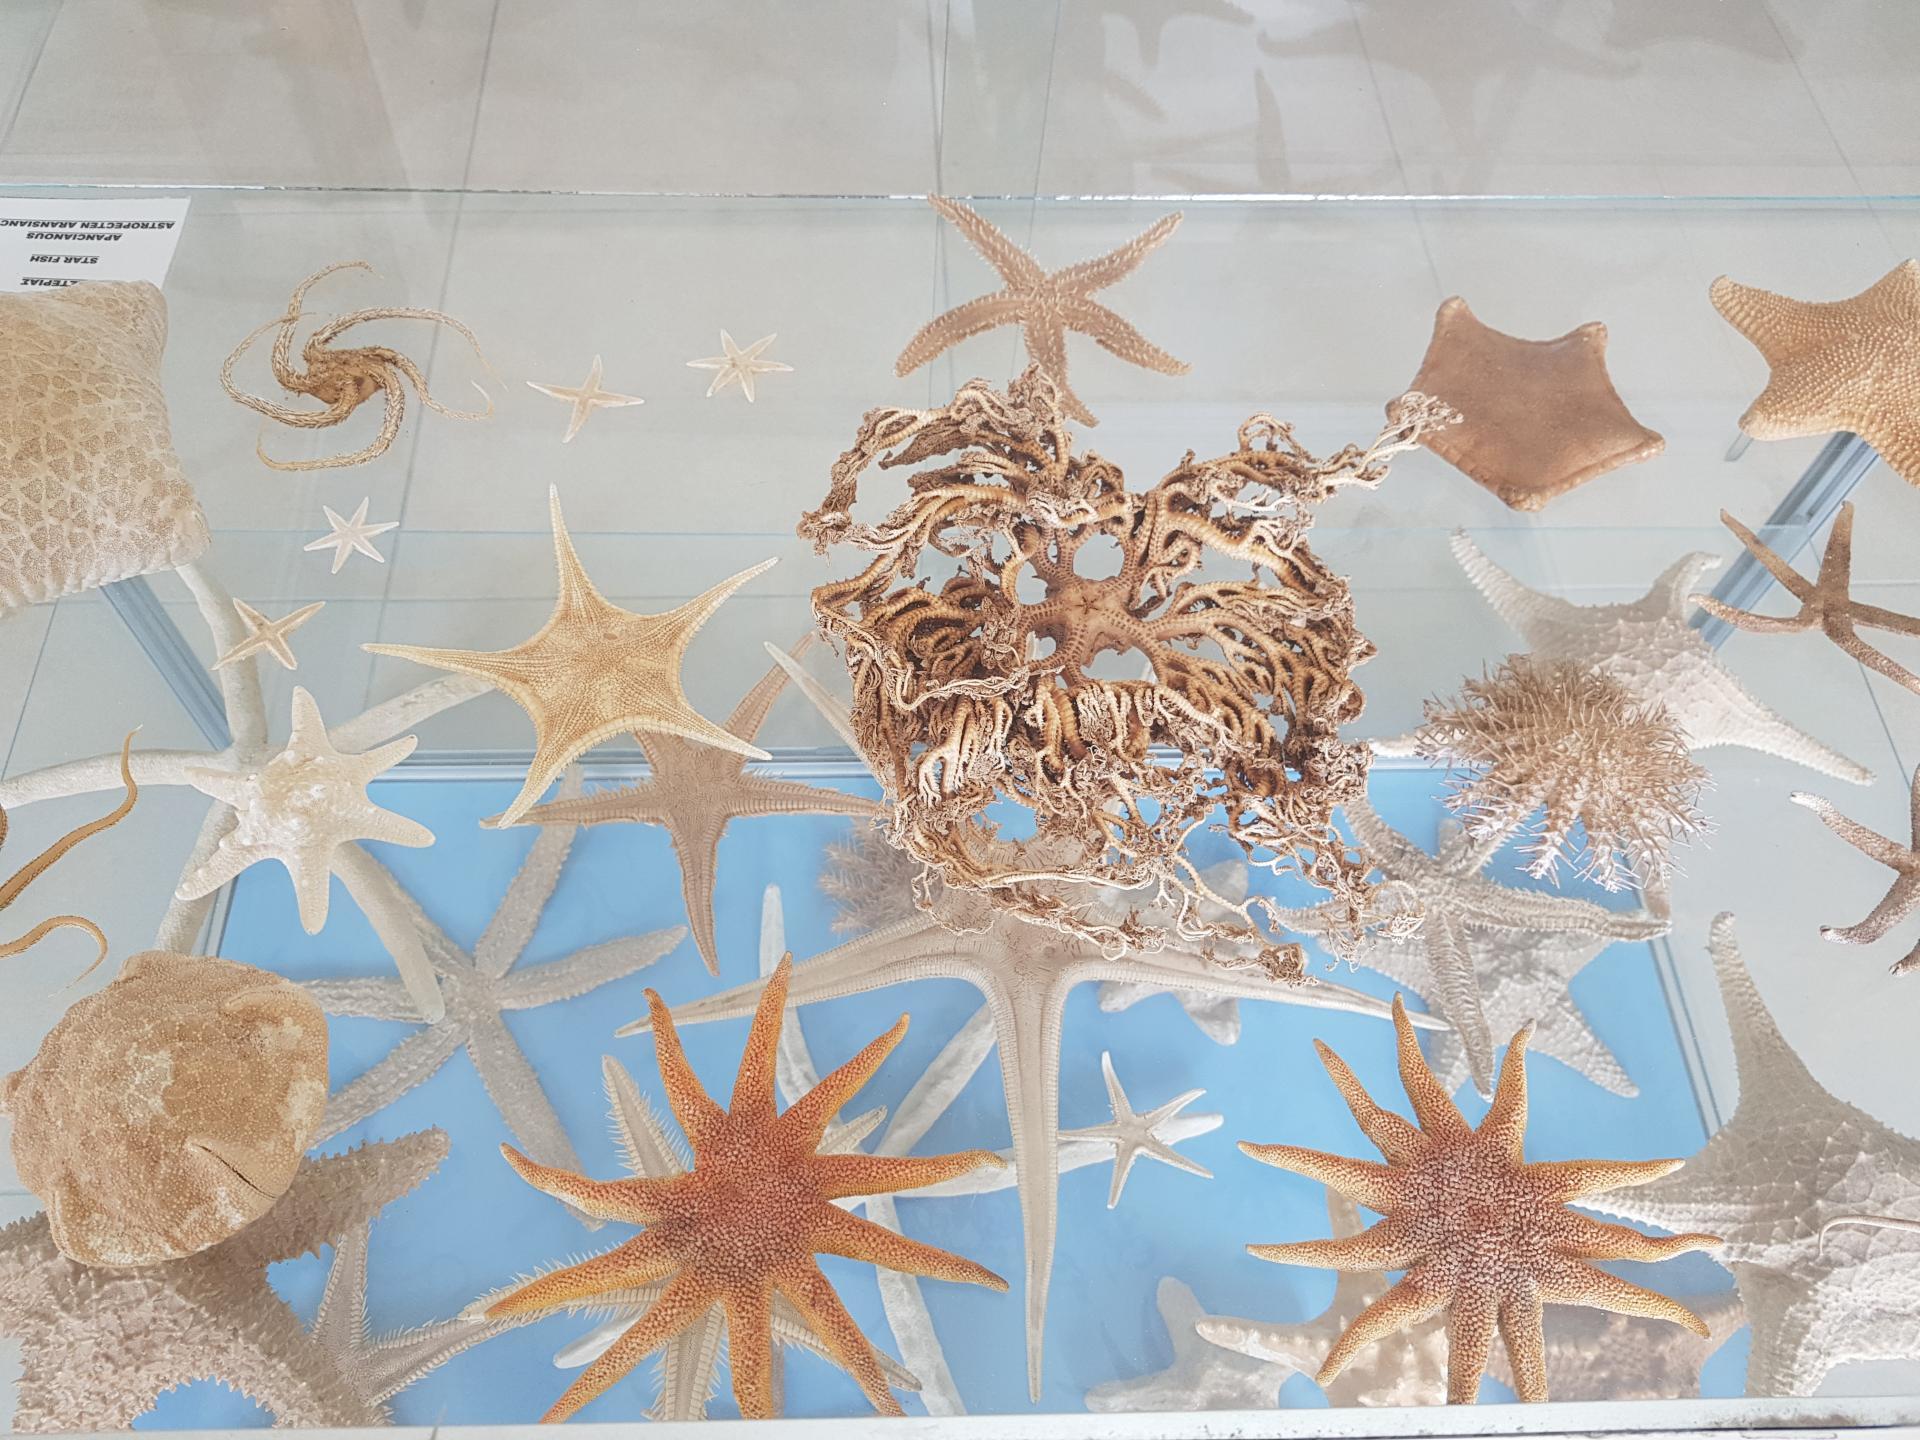 морские звезды в музее ракушек, Бенитсес